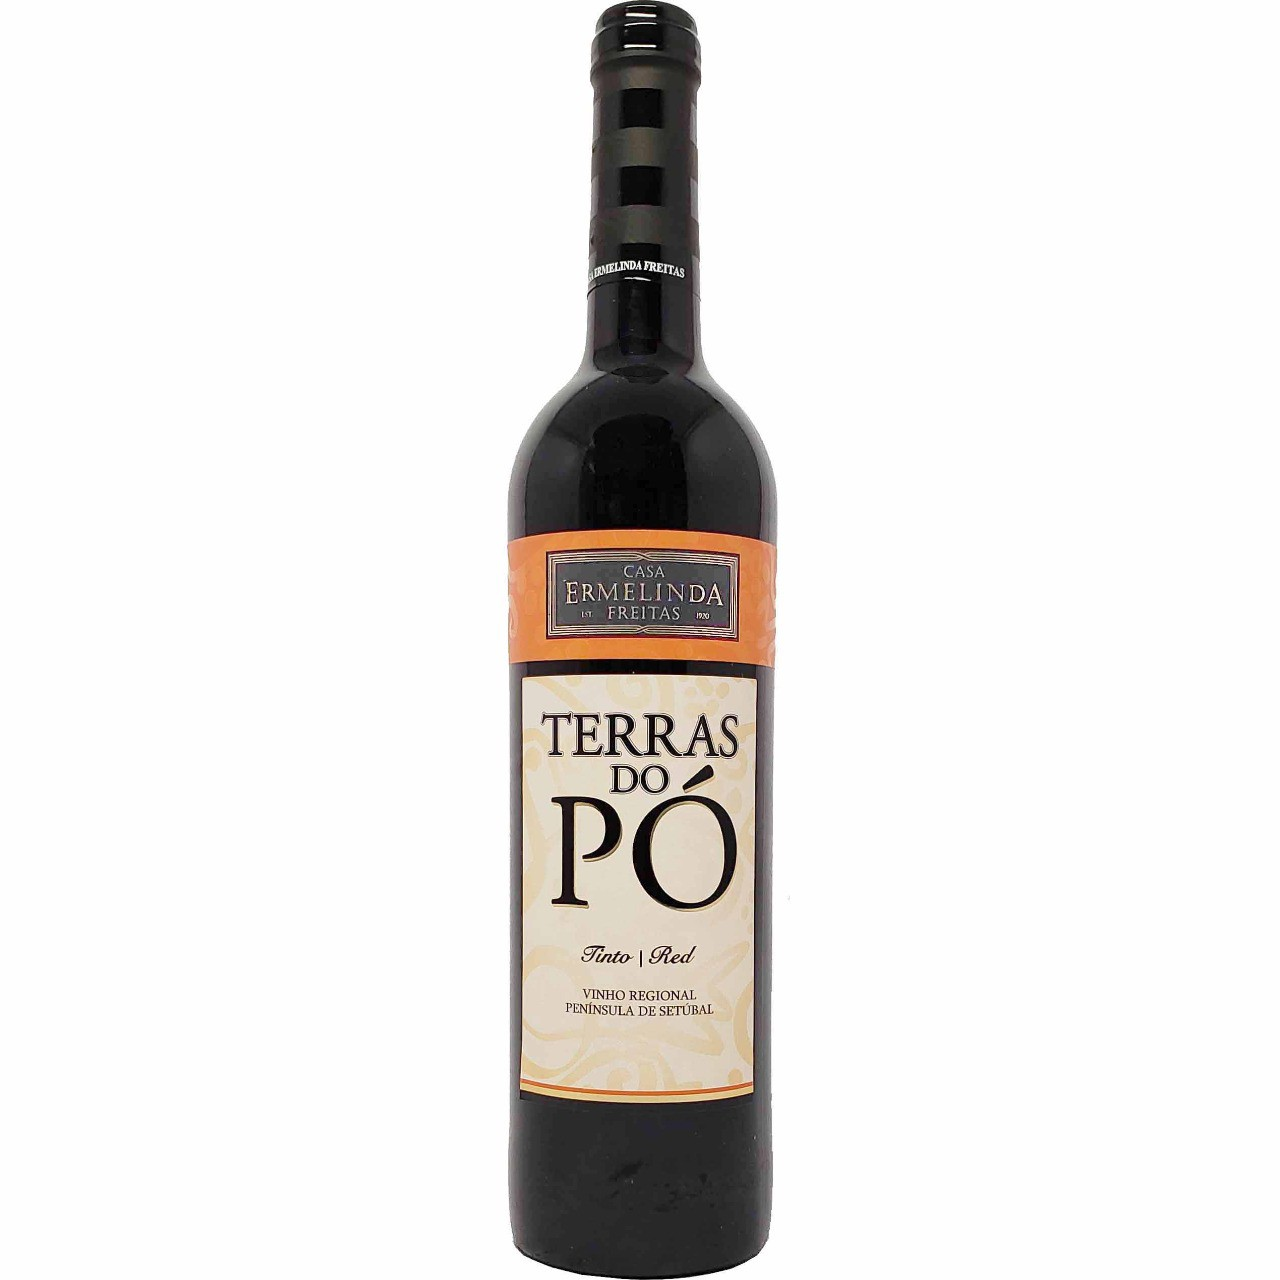 Vinho Tinto Terras do Pó Casa Ermelinda Freitas - 750ml -